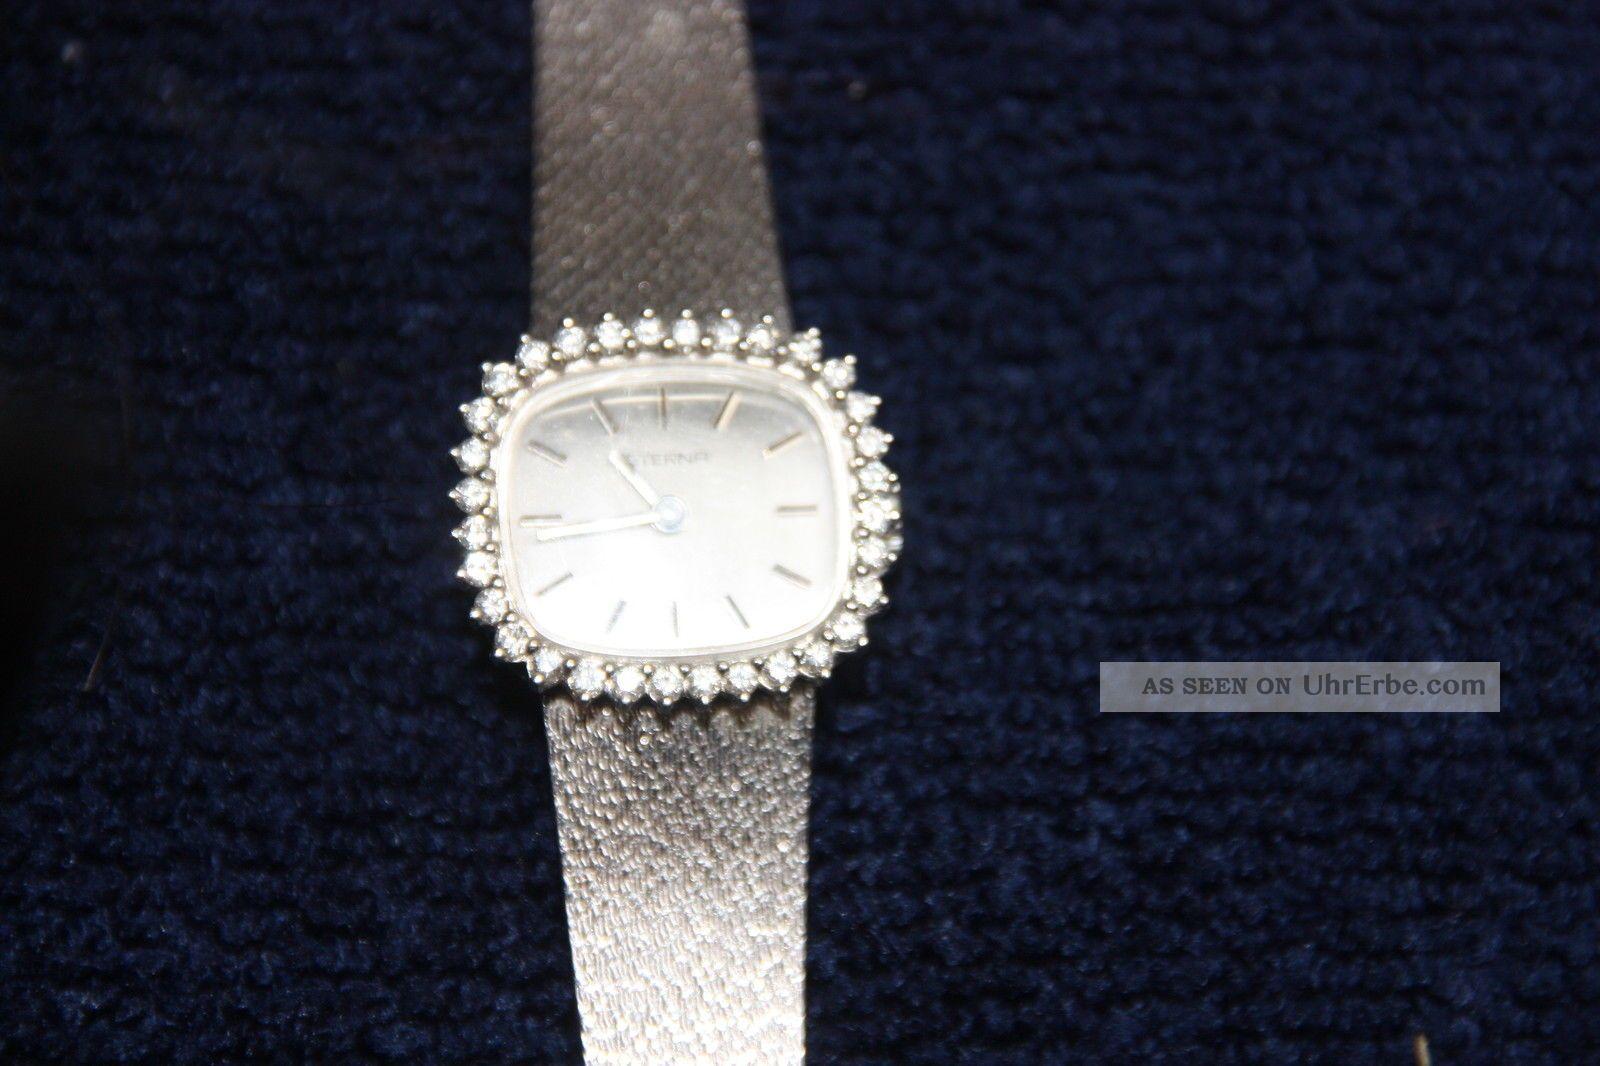 Eterna Weißgolduhr (750 - 18 Kt. ) Mit Brillianten Ca.  0,  50 Carat Armbanduhren Bild